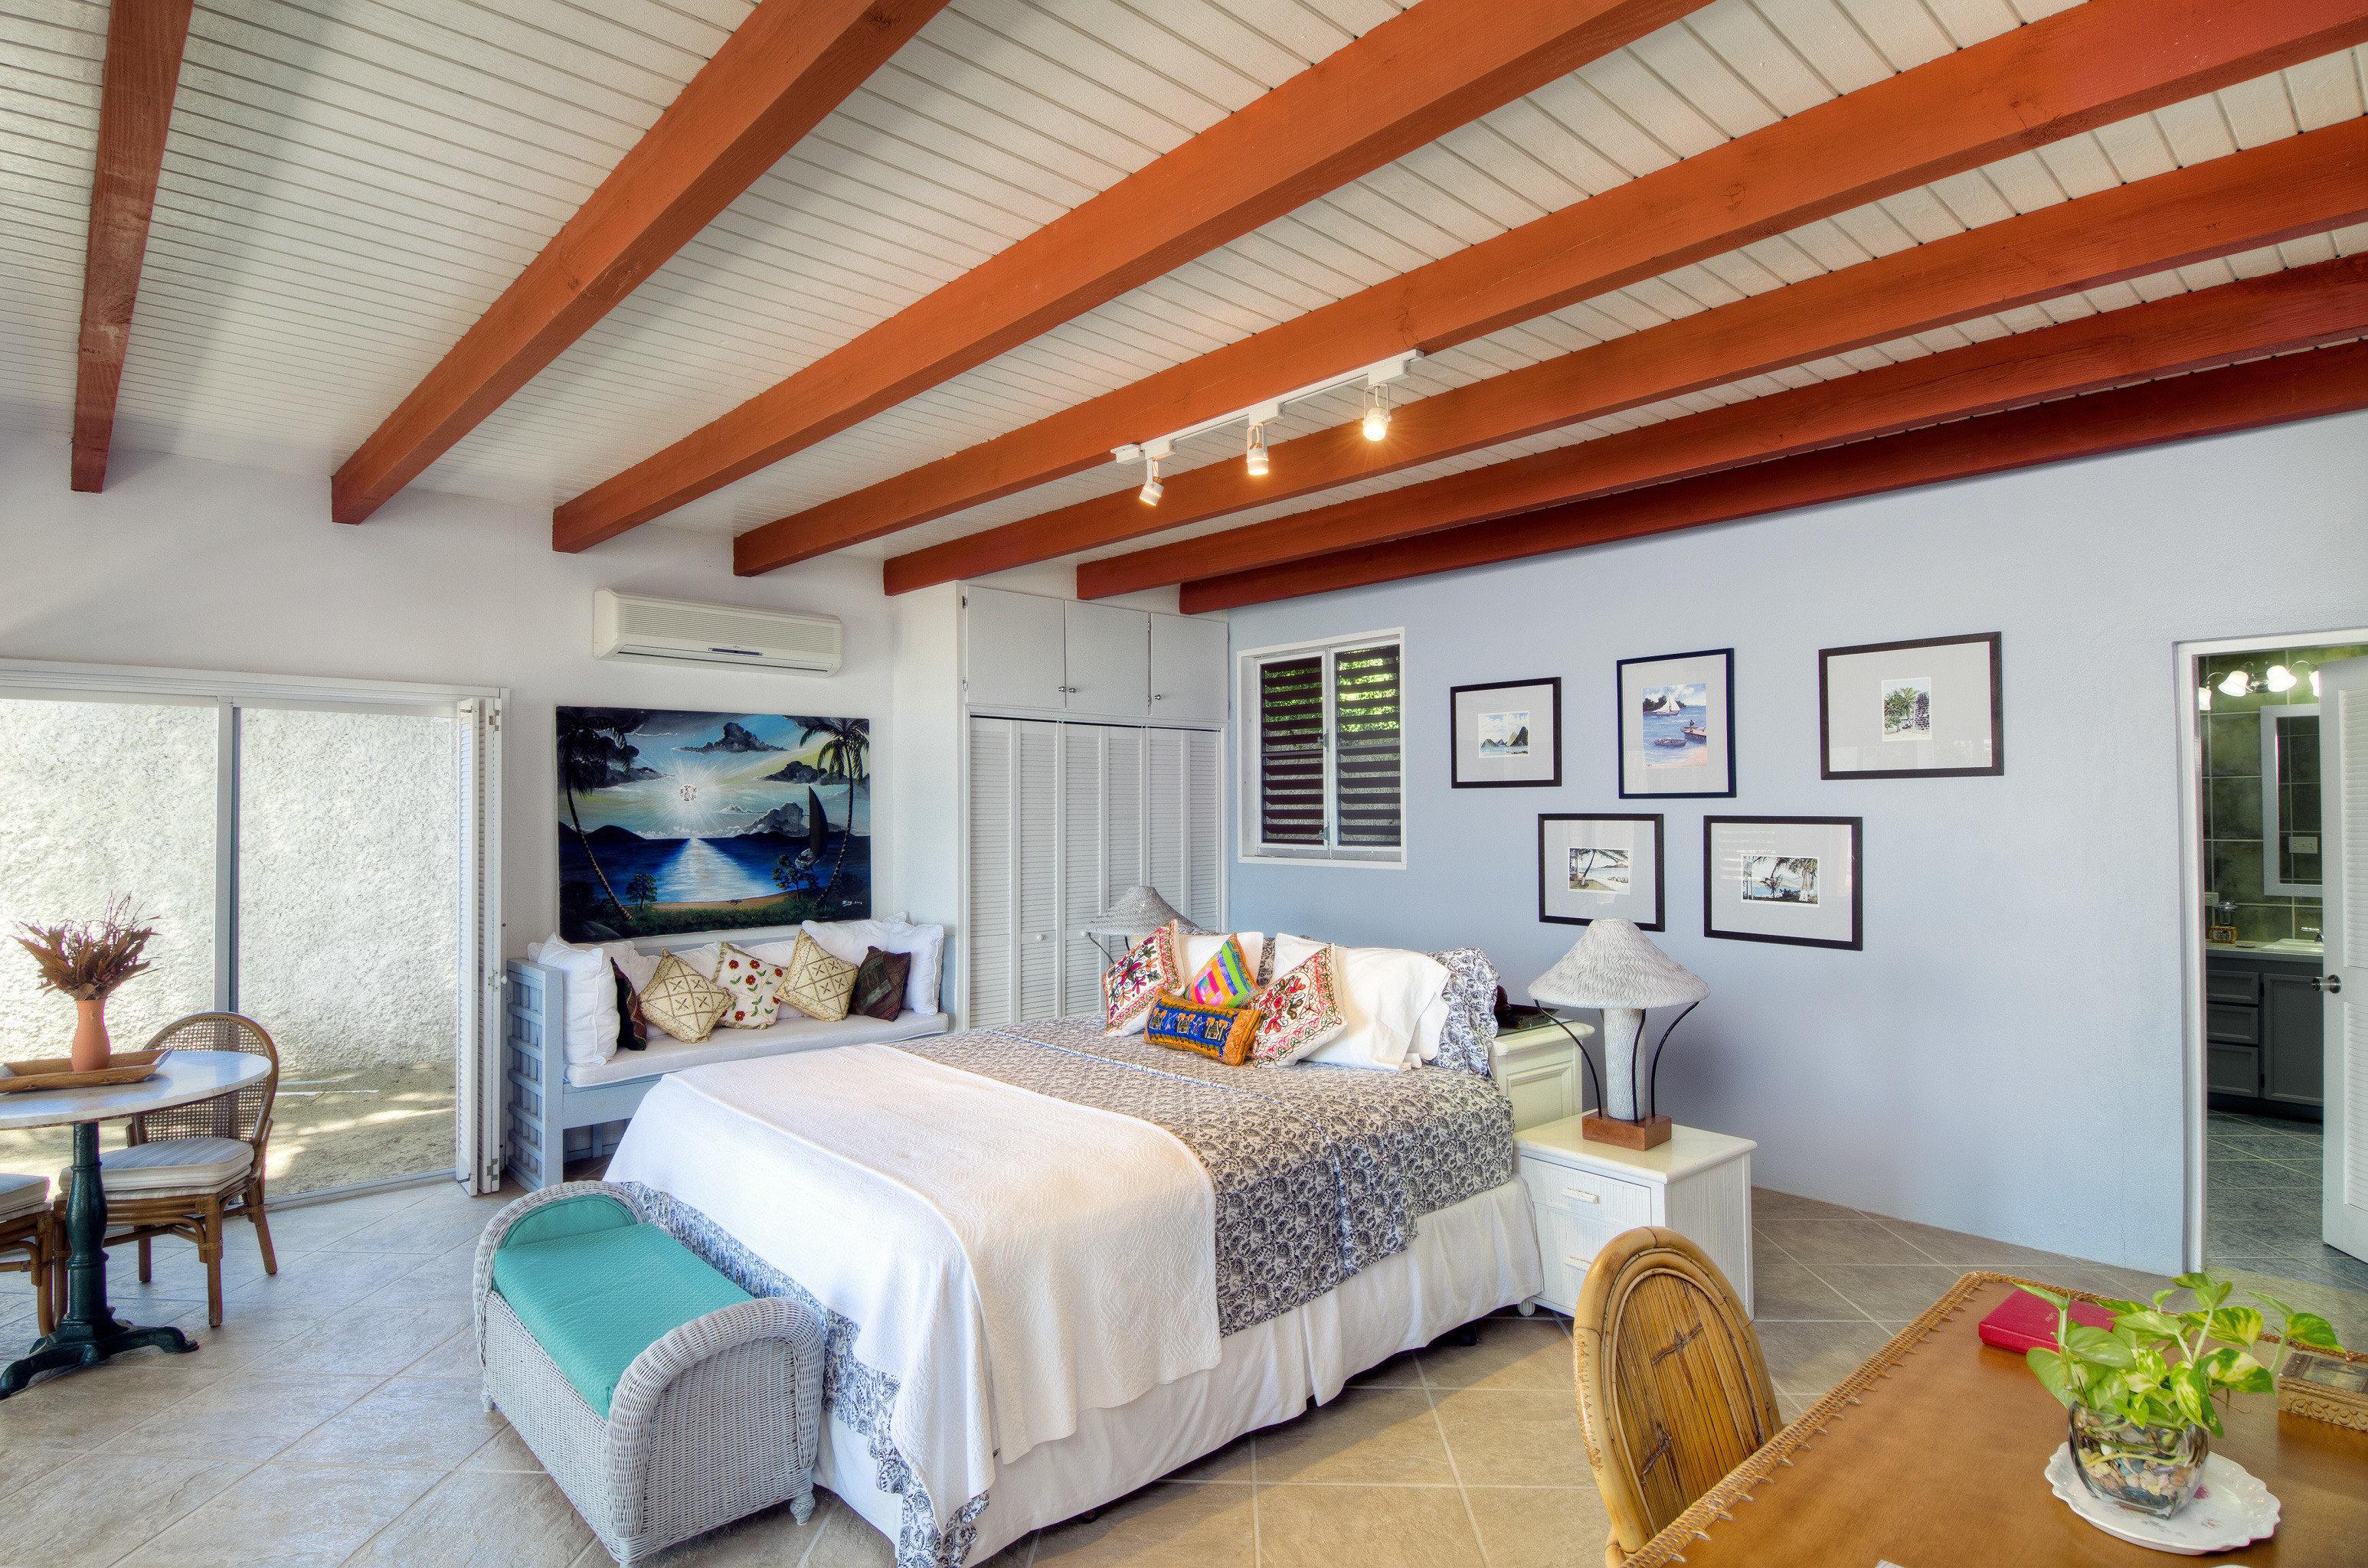 Bedroom Modern Suite property Villa cottage living room home Resort farmhouse condominium